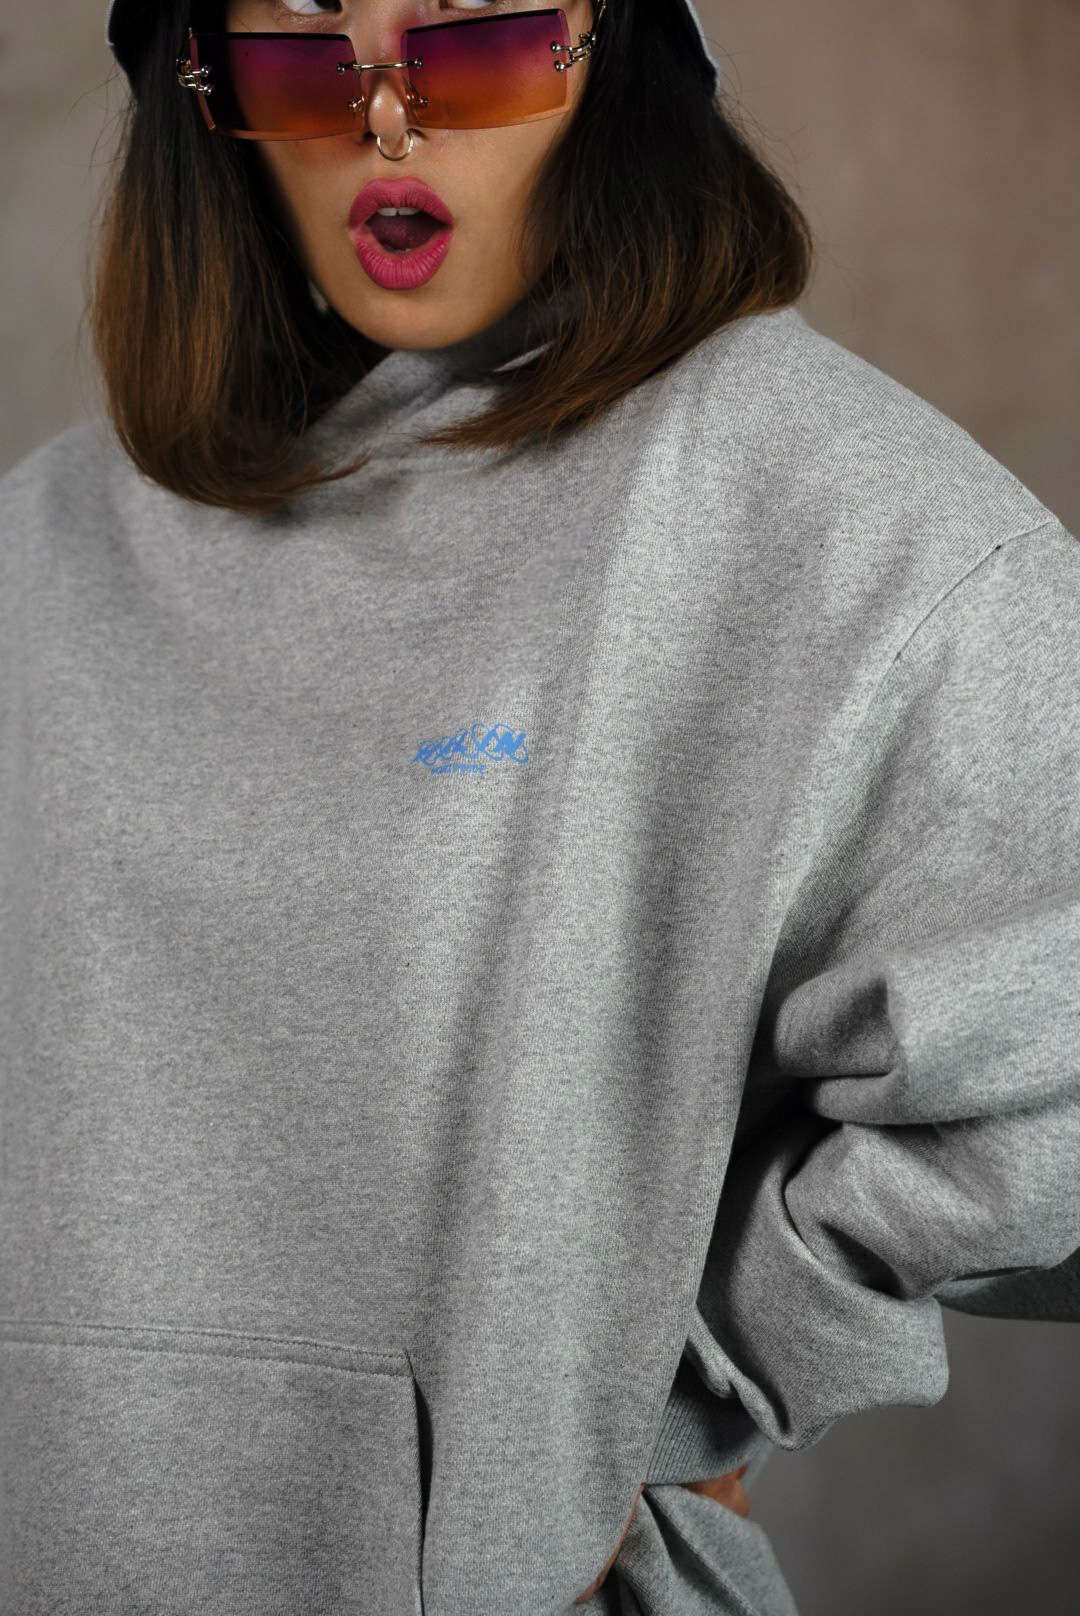 Female streetwear model wearing Halin Bucket Hat and grey oversize hoodie.